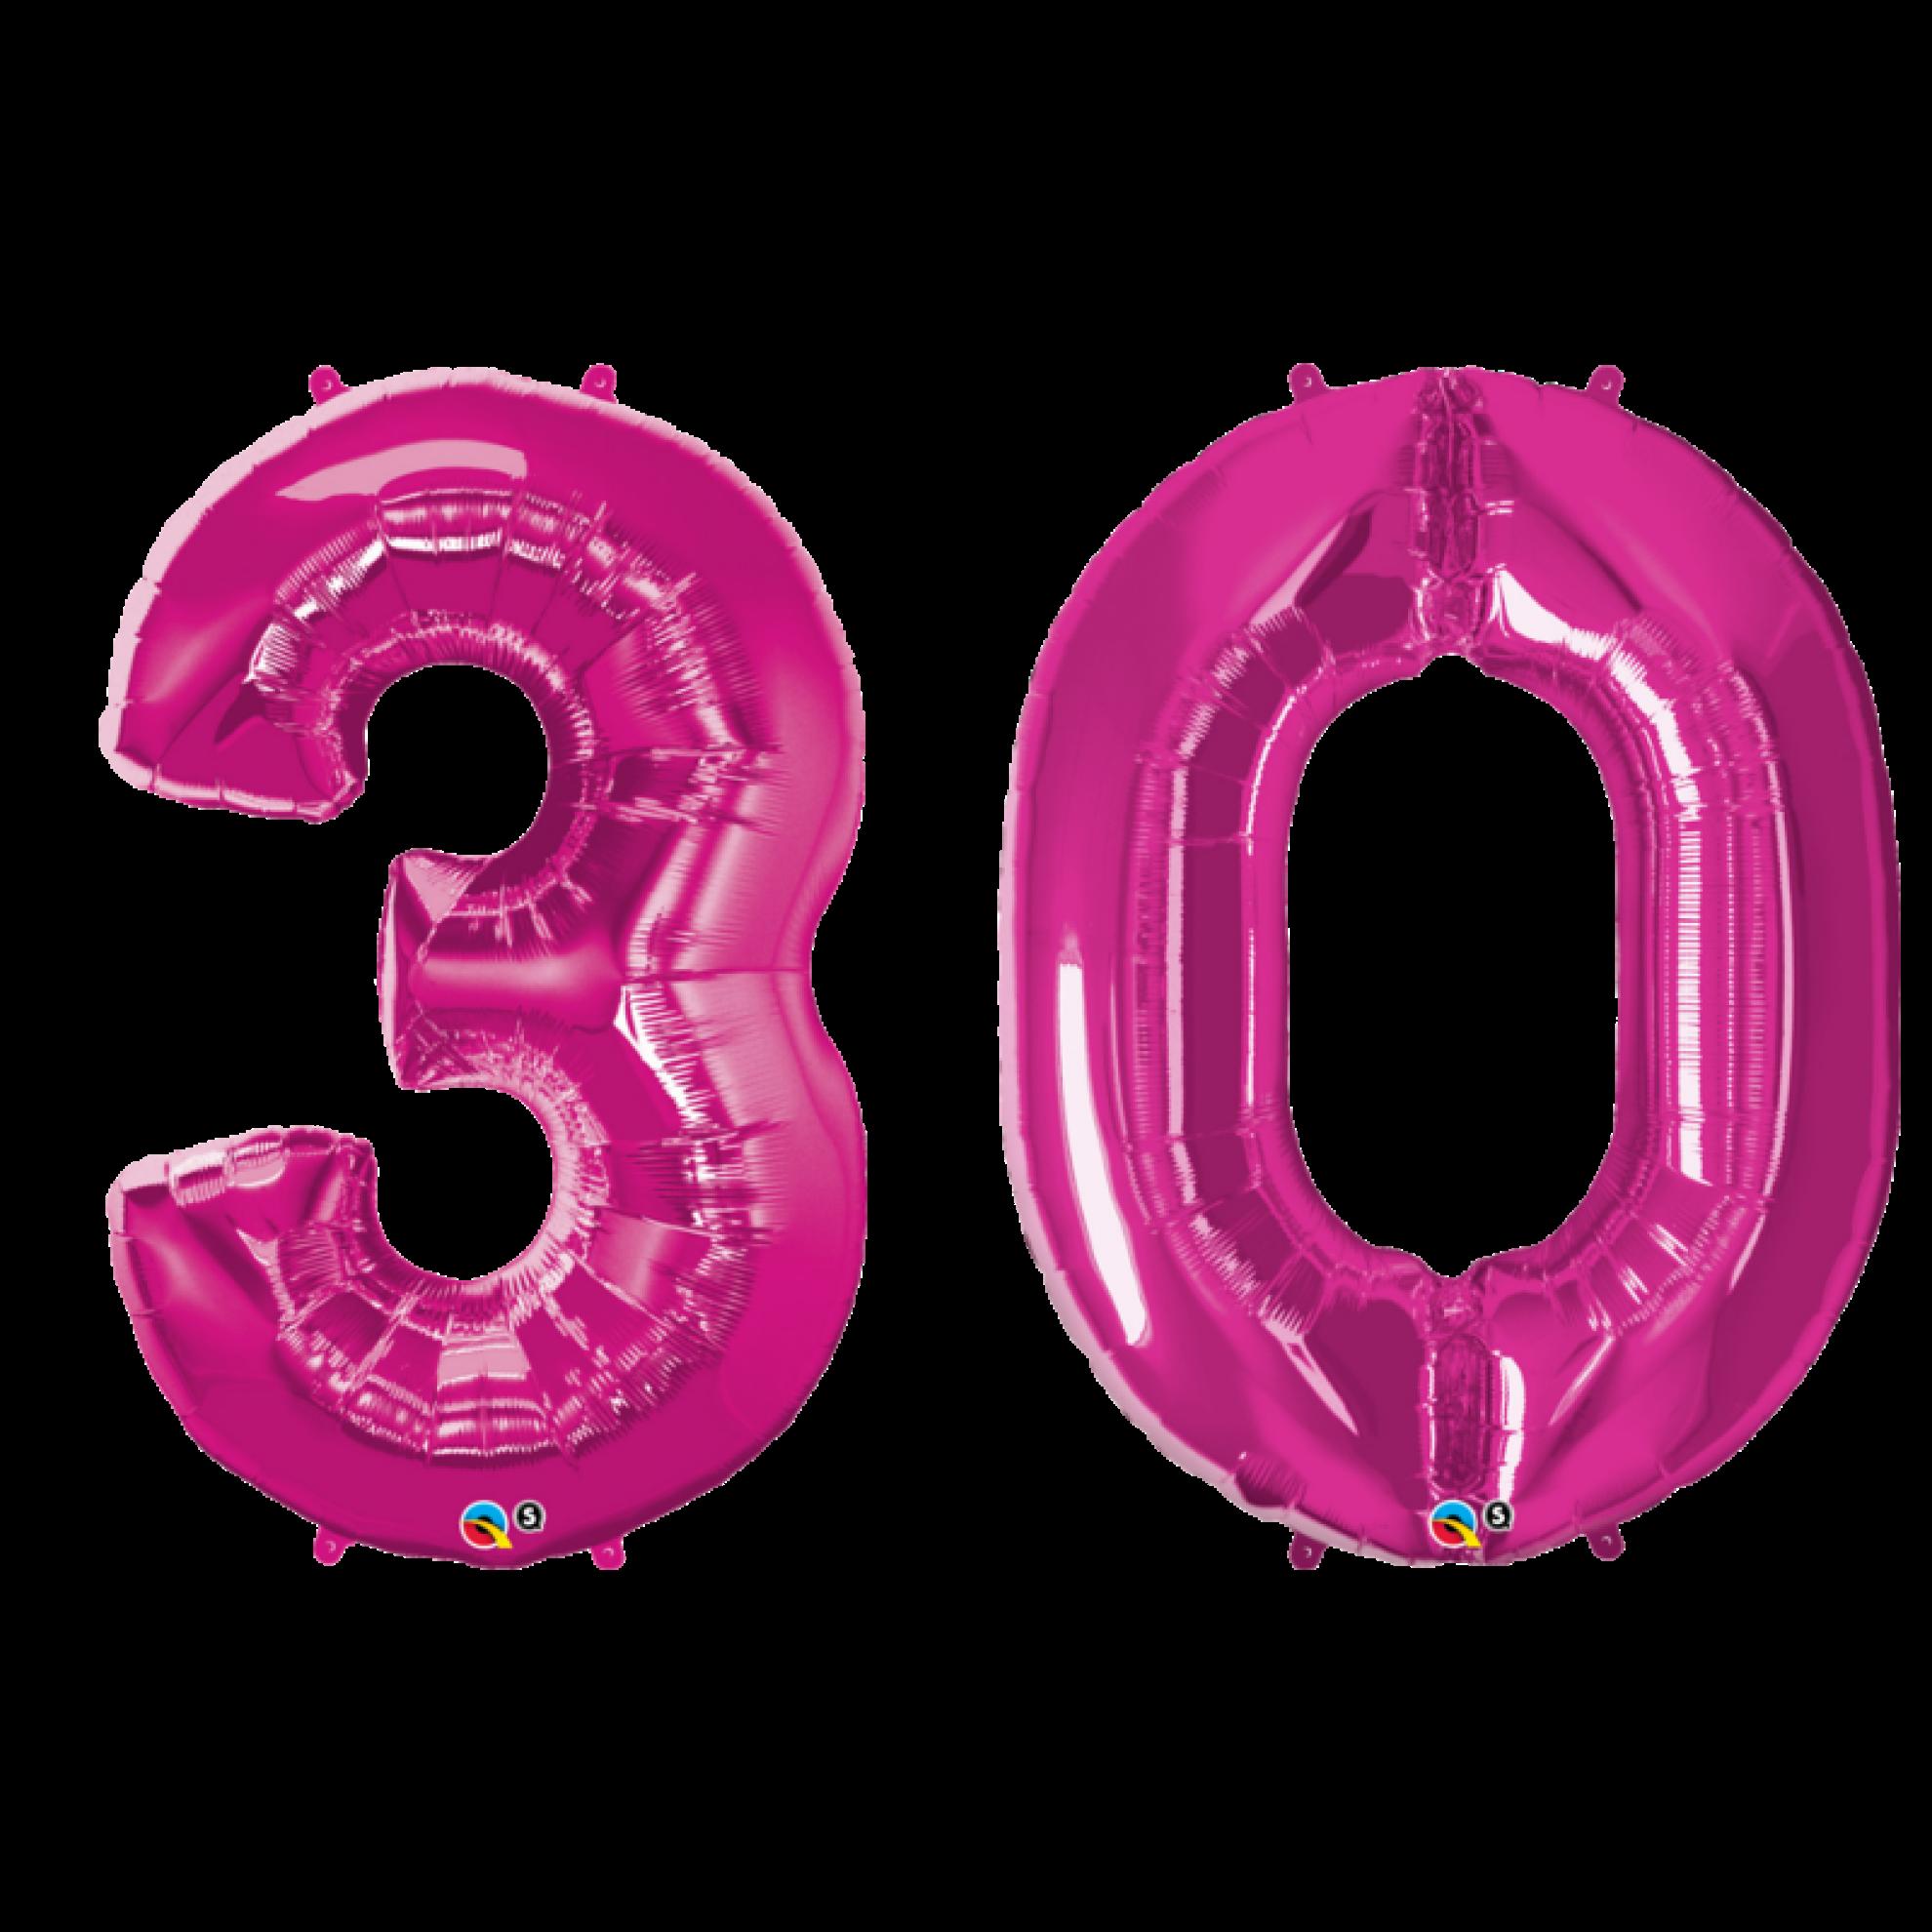 Folienballon set zahl 30 pink 86 cm for Geburtstagsdeko 30